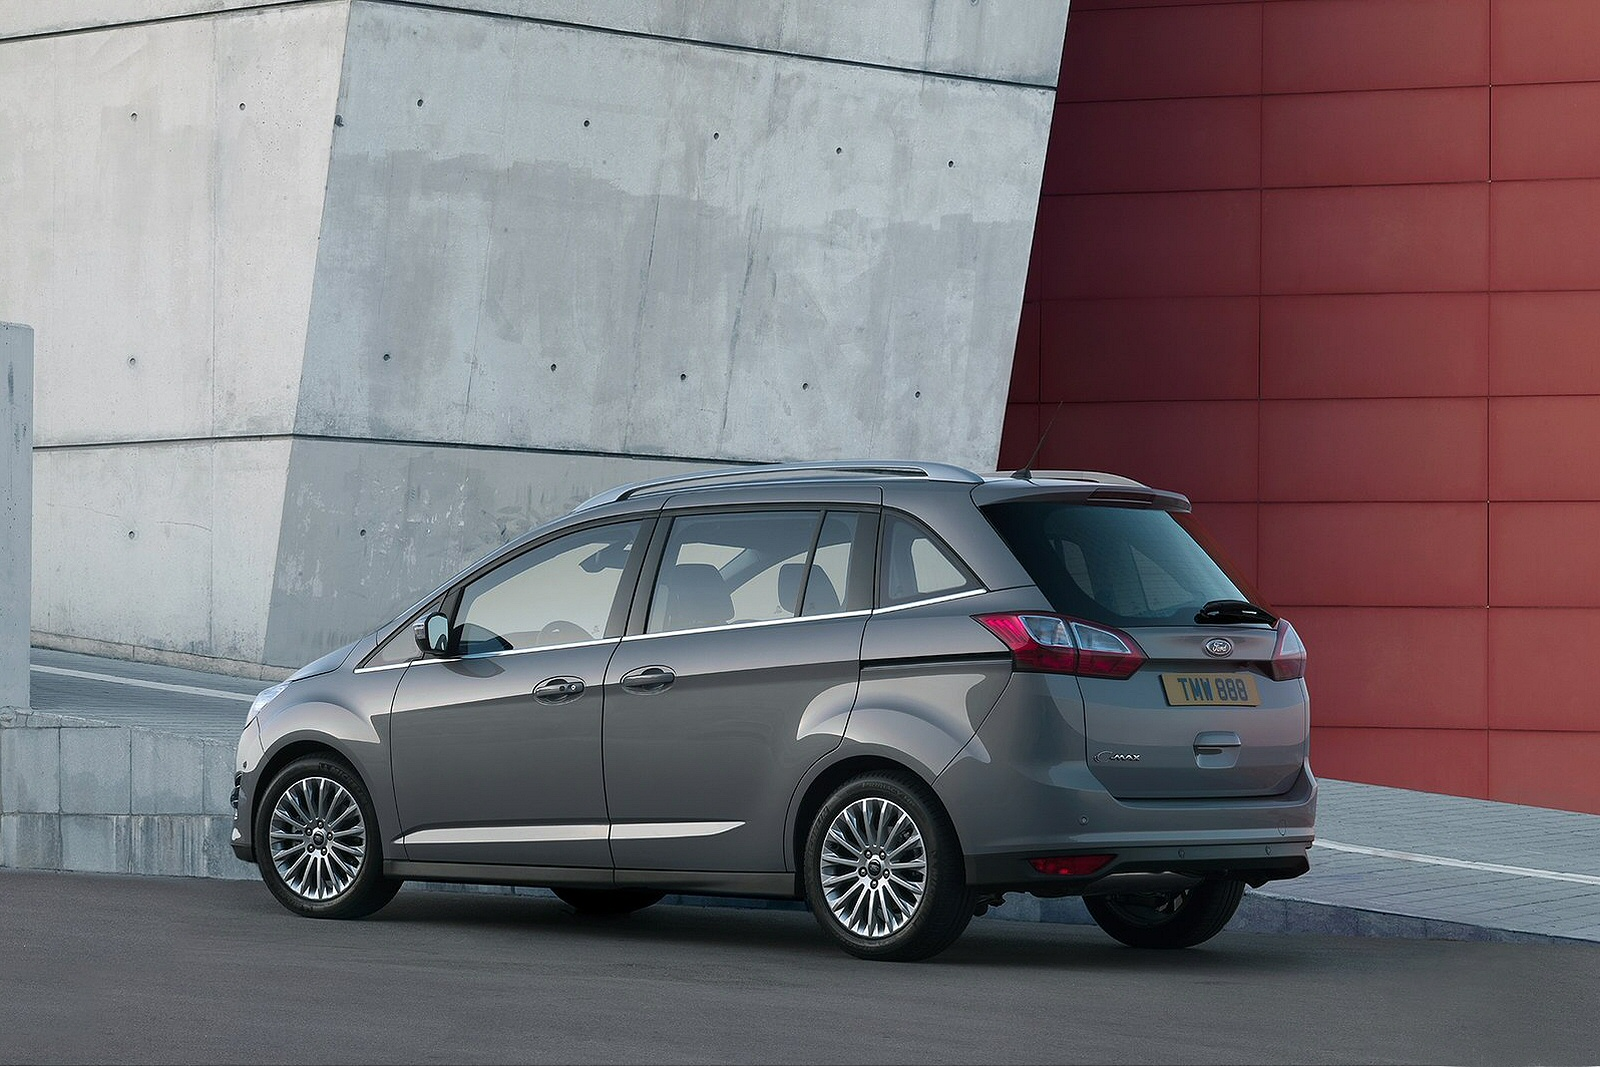 new ford grand c max 1 0 ecoboost 125 zetec 5dr petrol. Black Bedroom Furniture Sets. Home Design Ideas